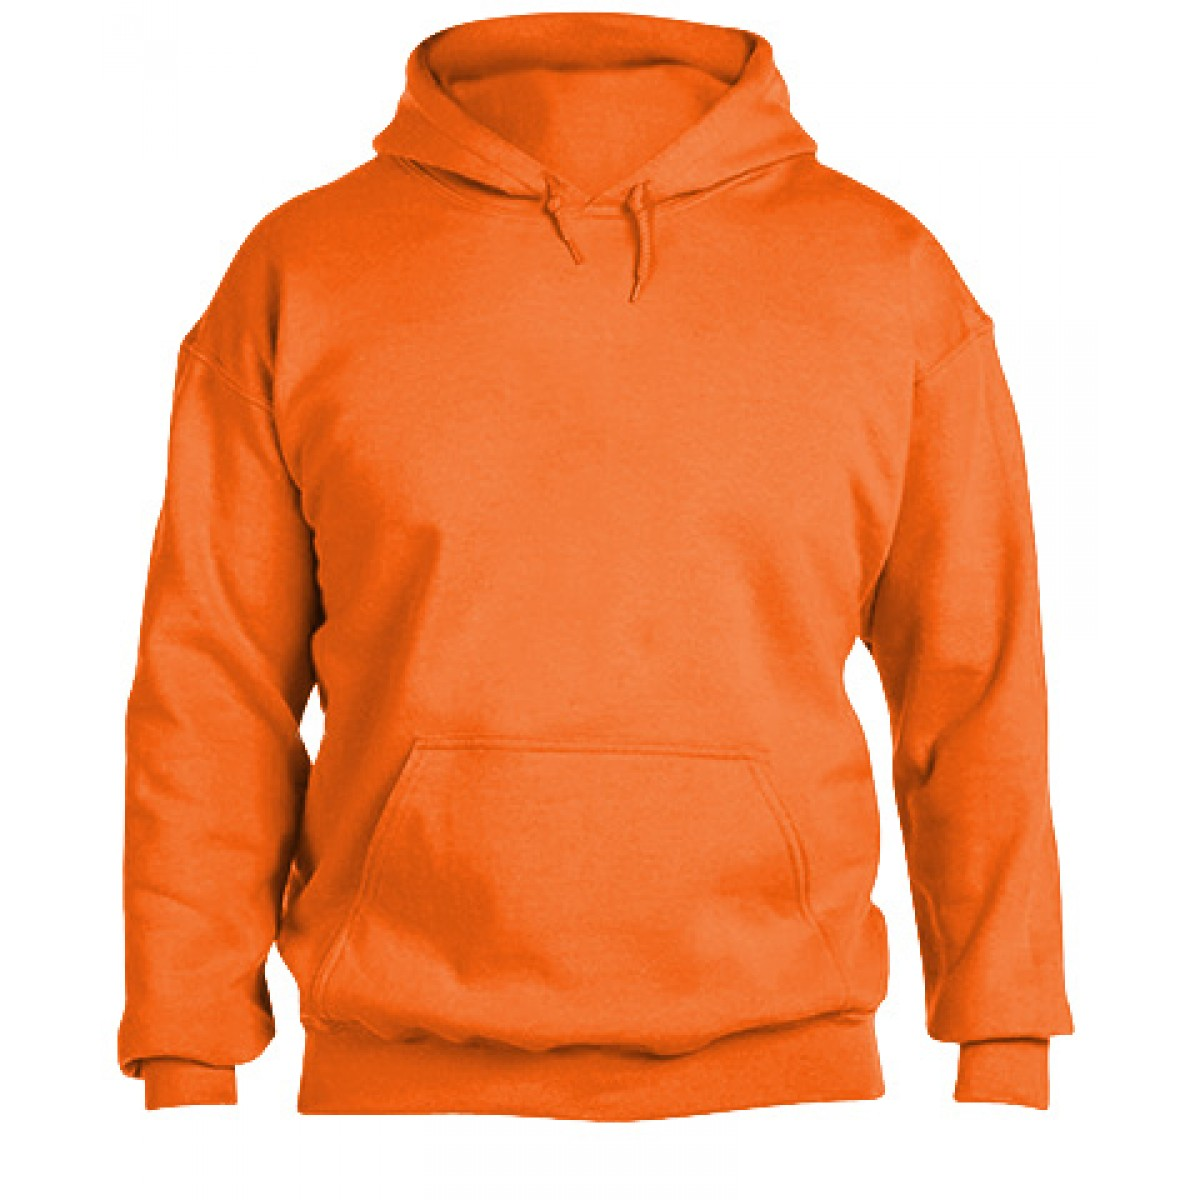 Hooded Sweatshirt  50/50 Heavy Blend-Safety Orange-YM